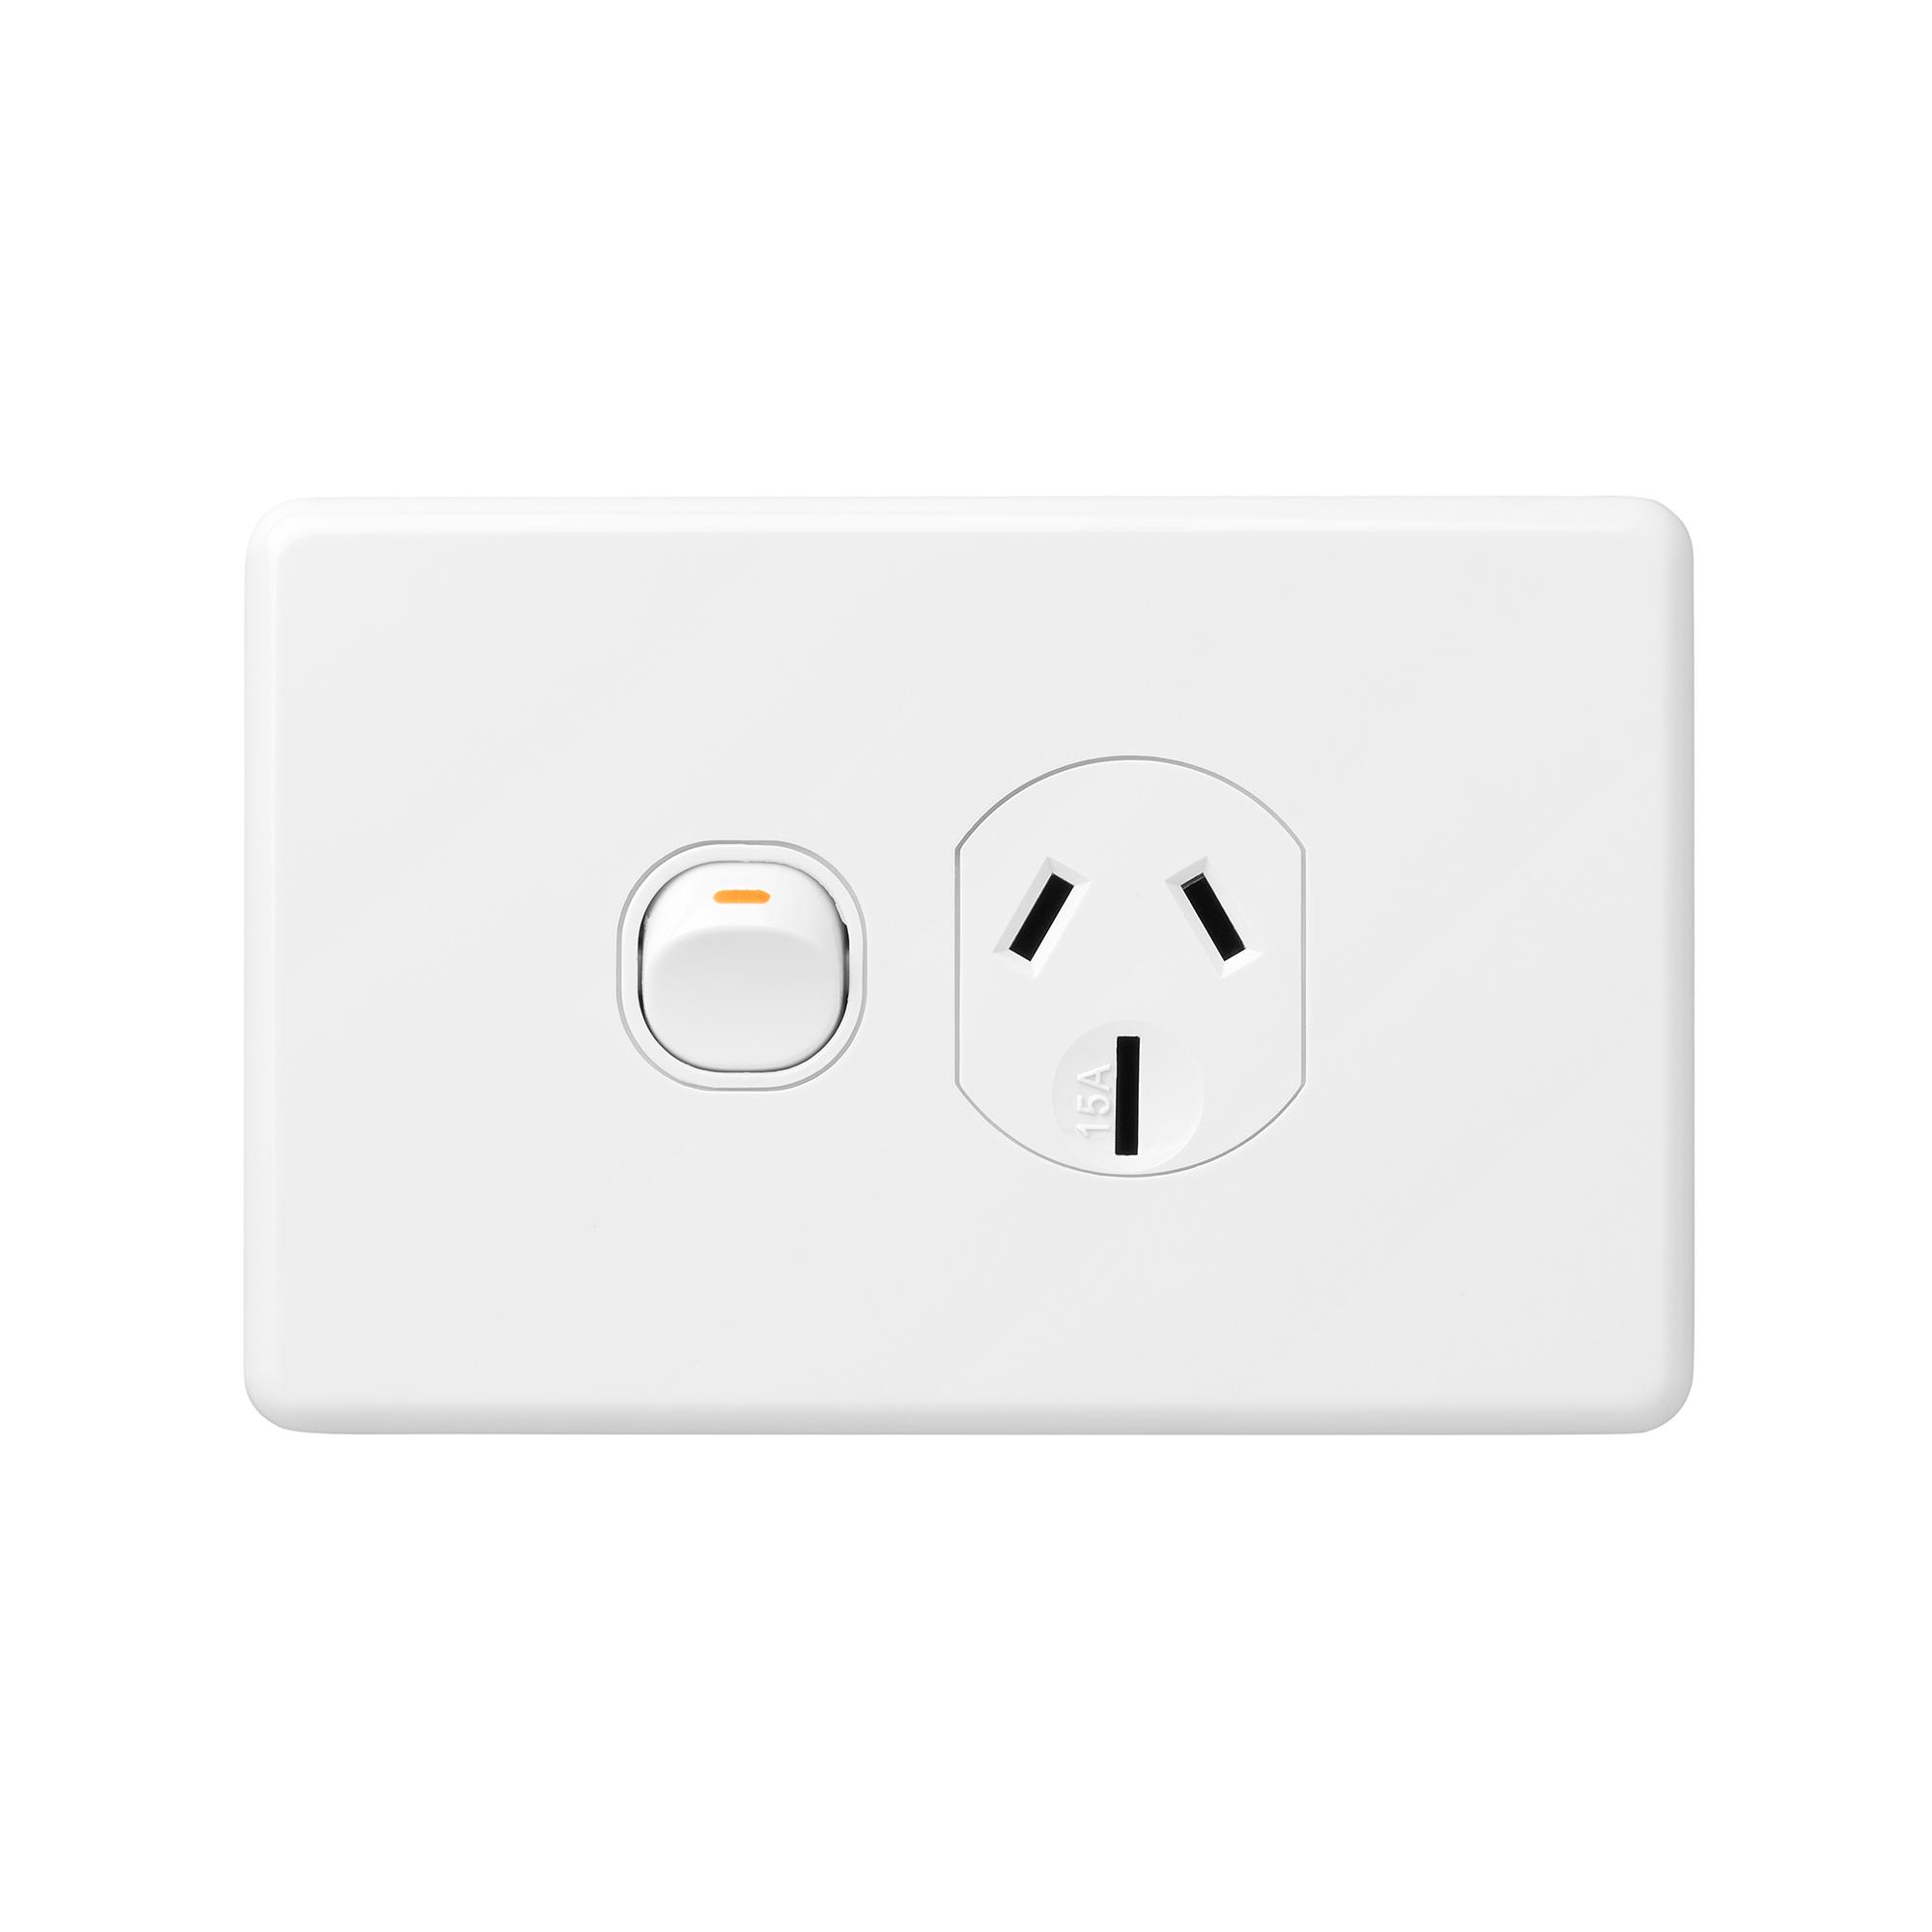 x6 15 amp single power point